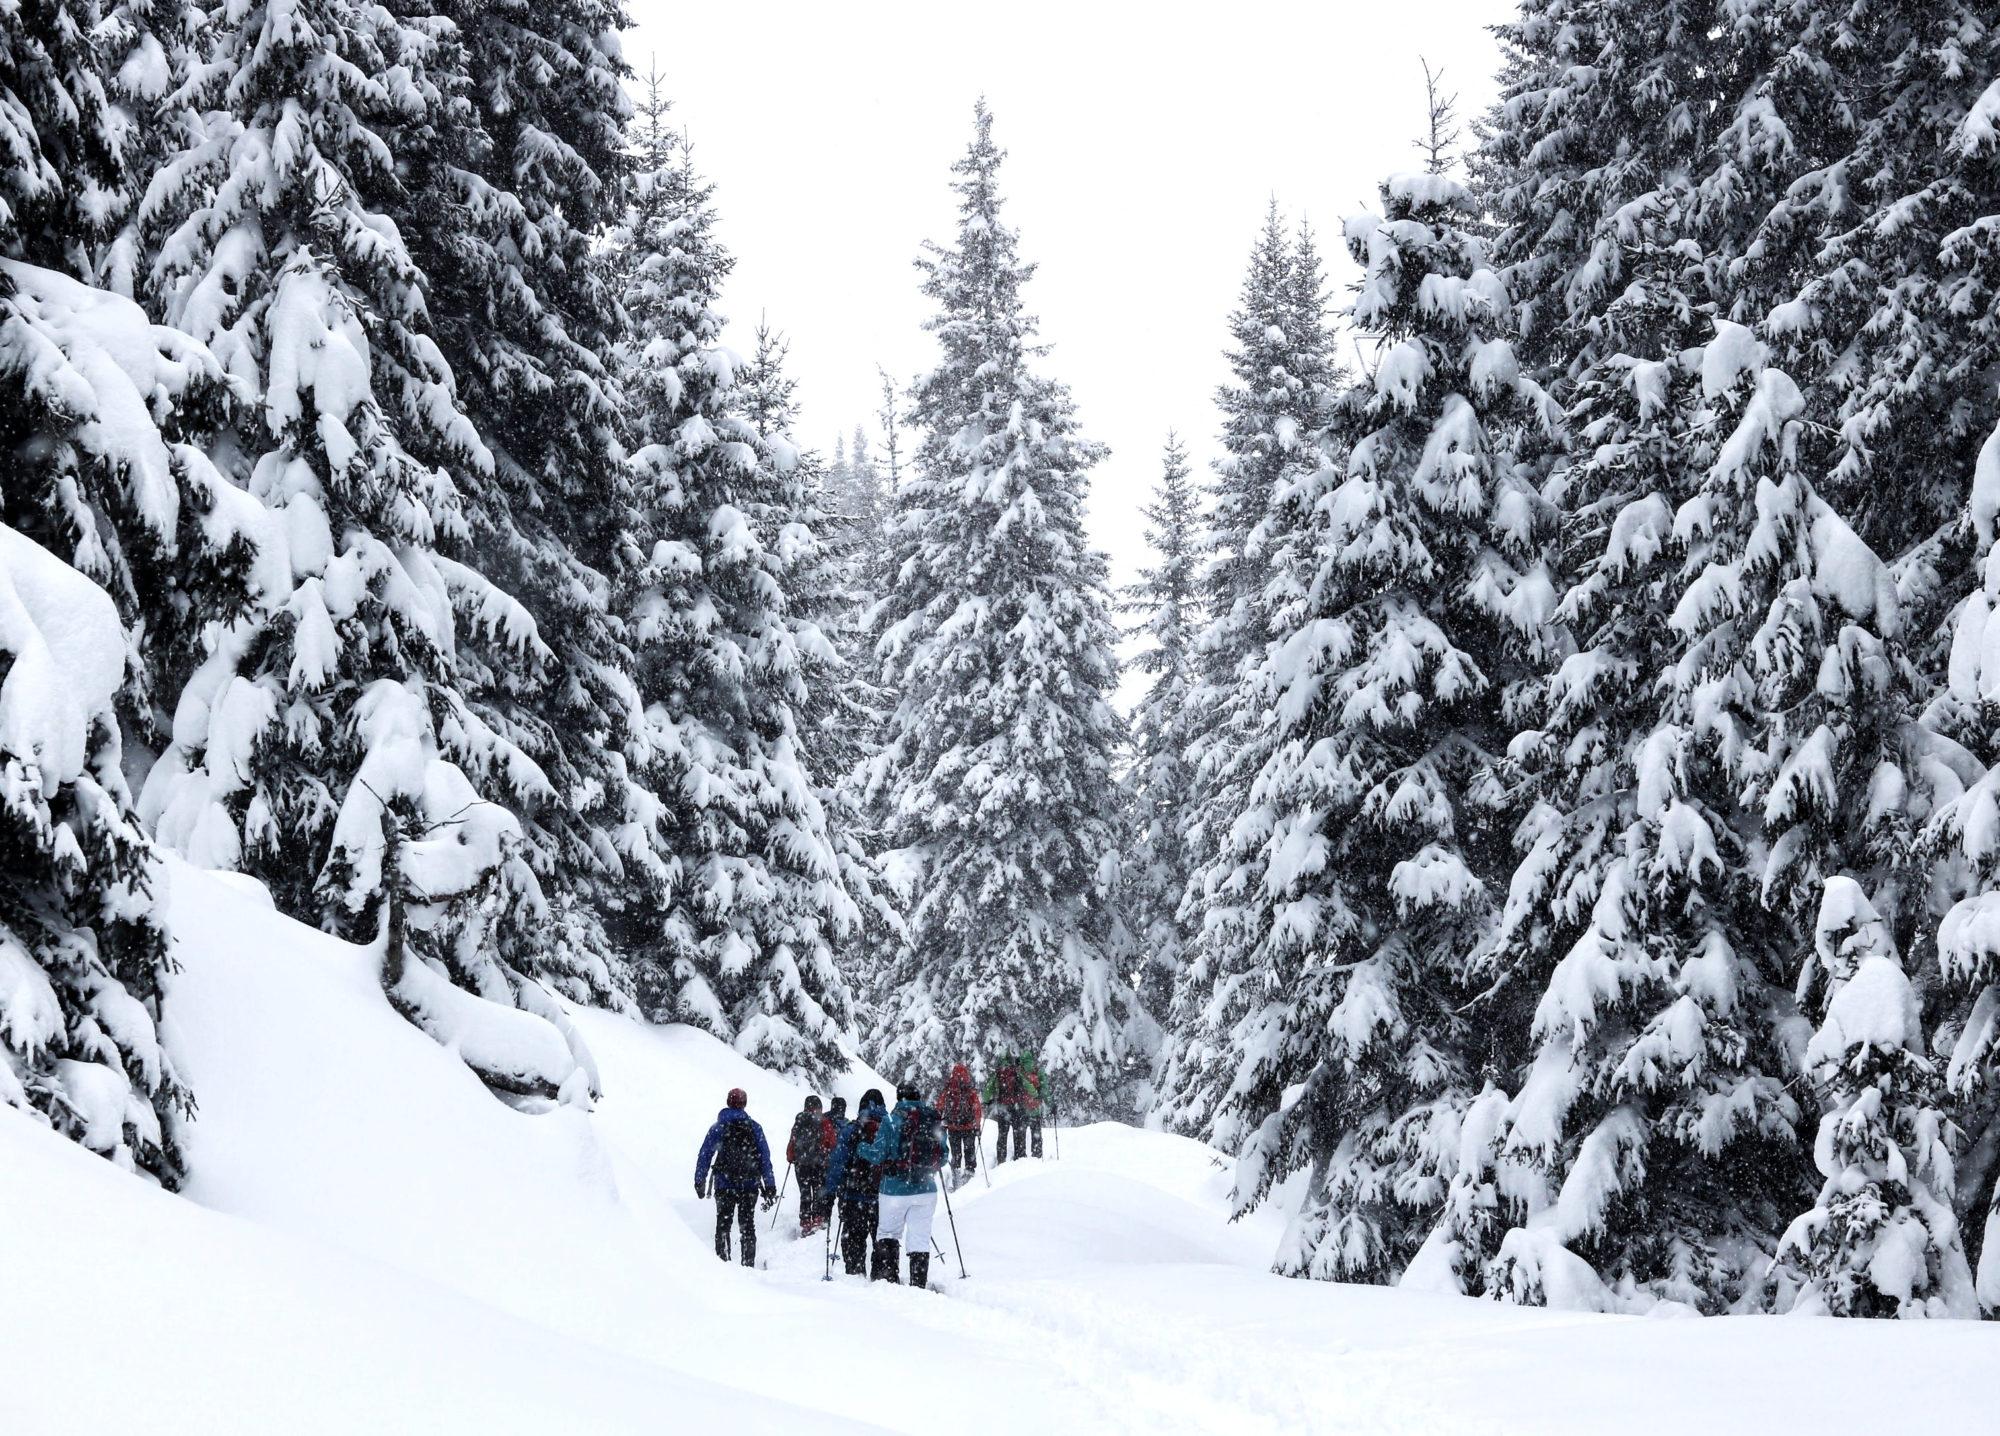 Schneeschuhwanderungen Brennerberge Tiefschnee